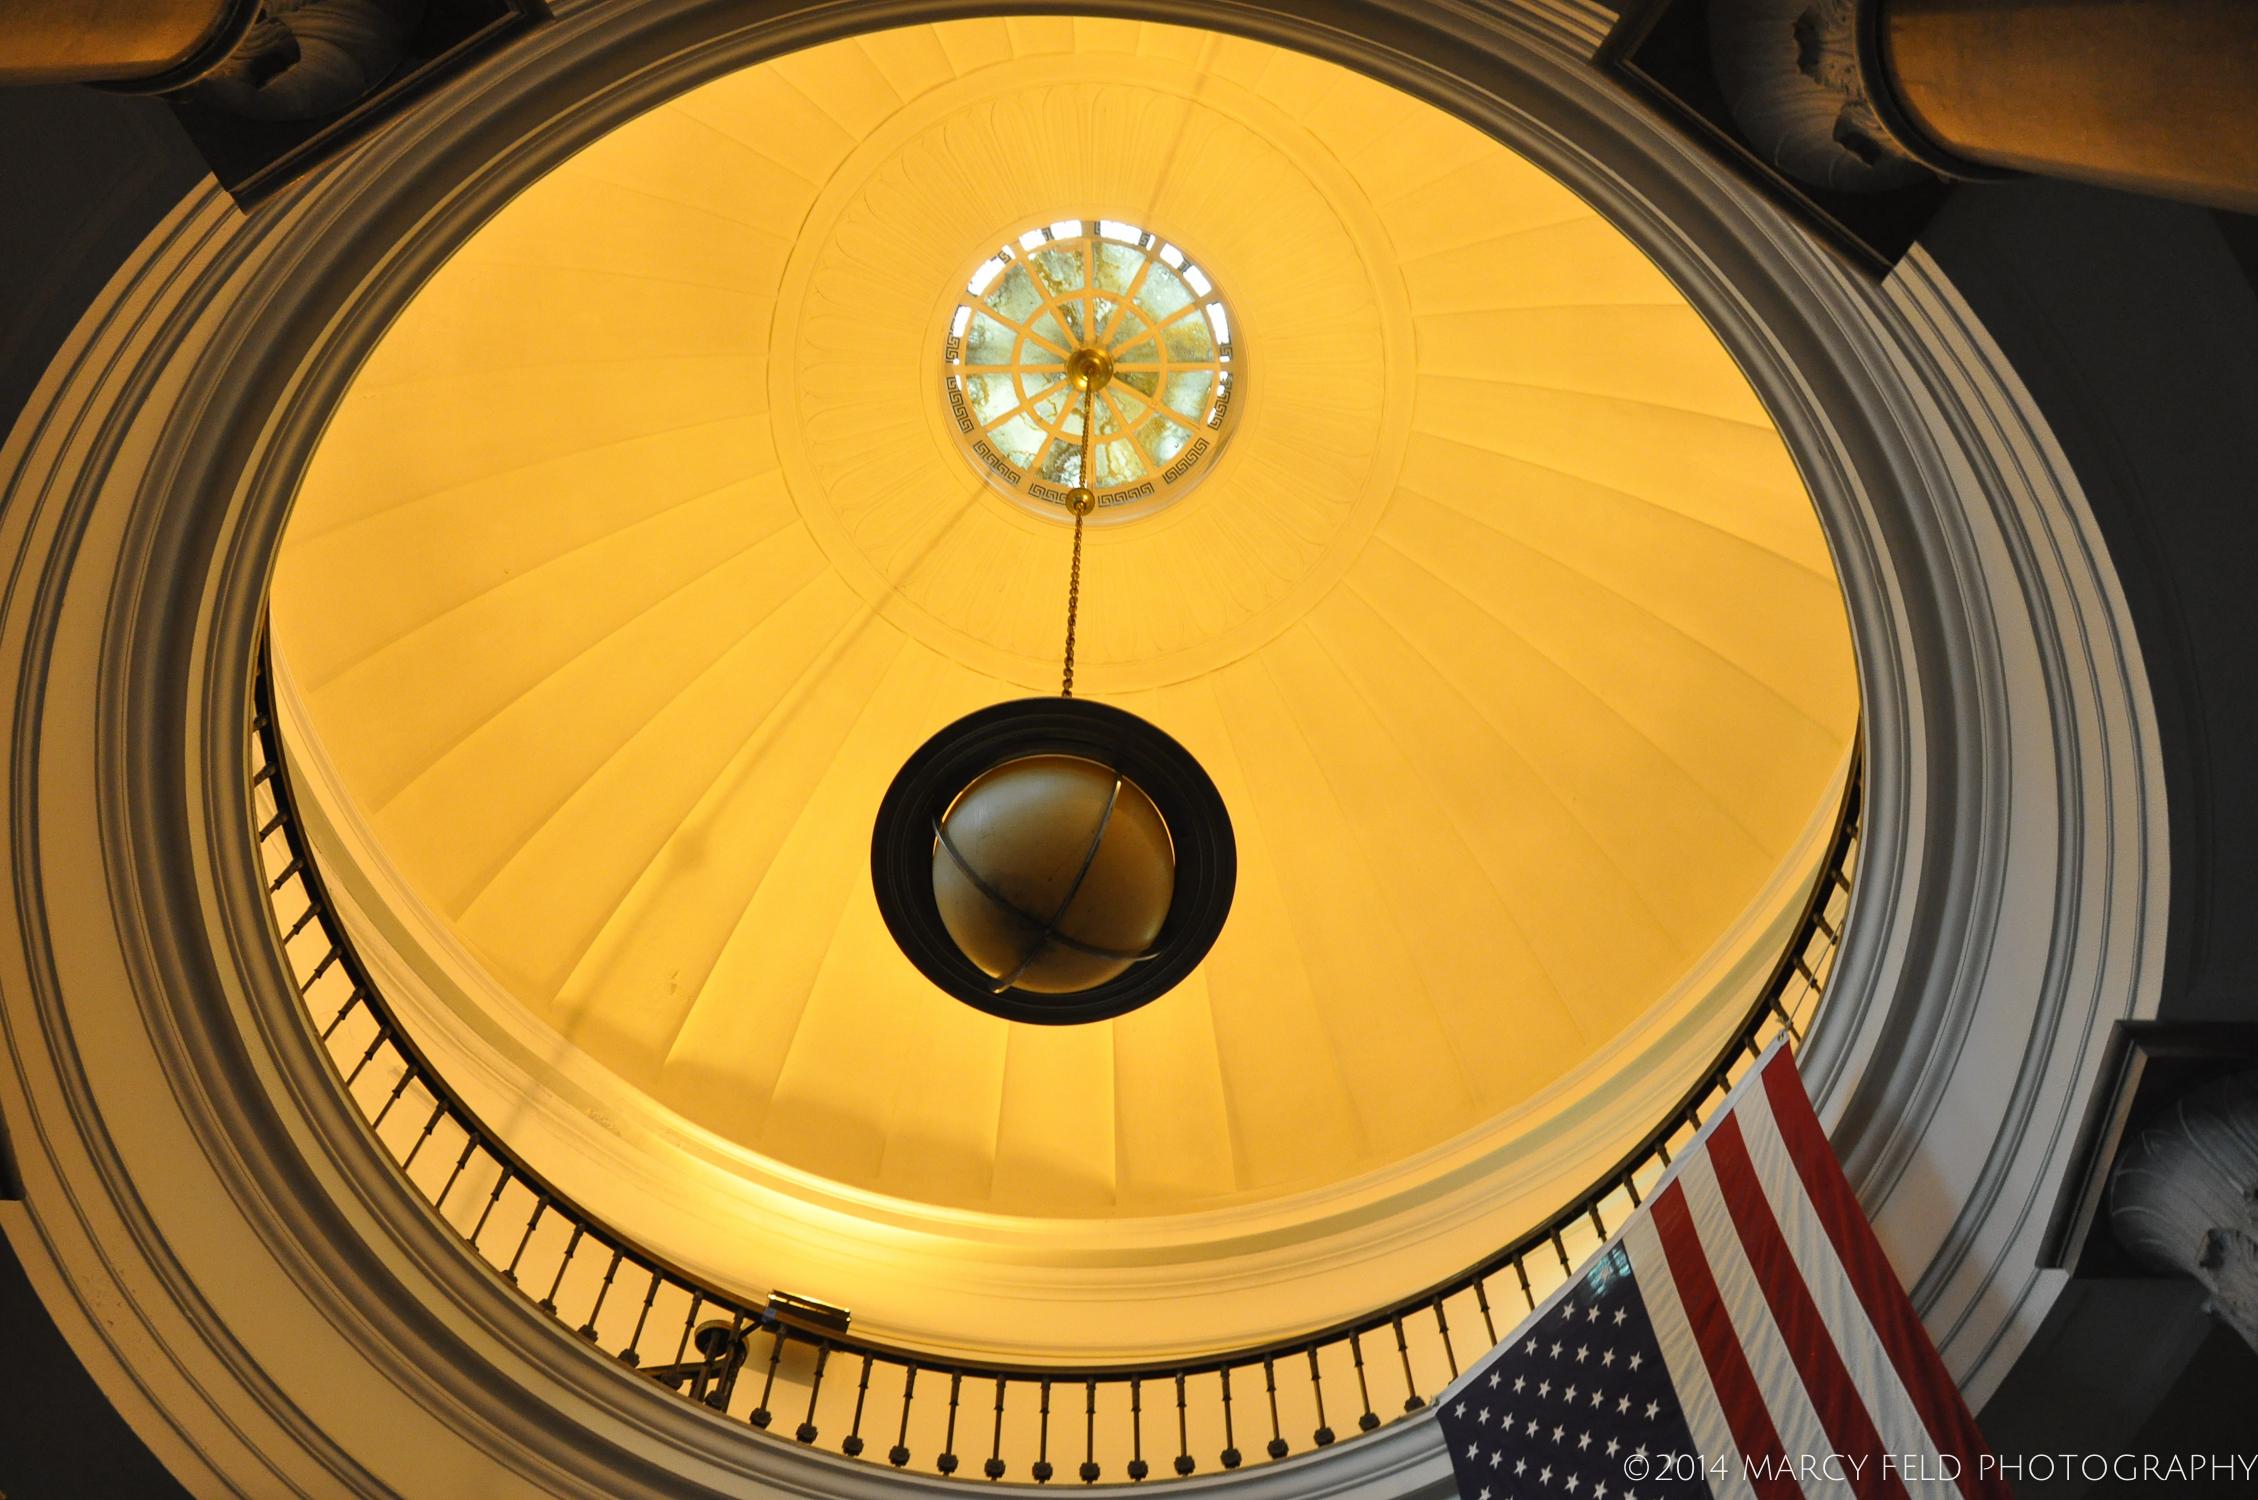 The rotunda of the Post Office 2014